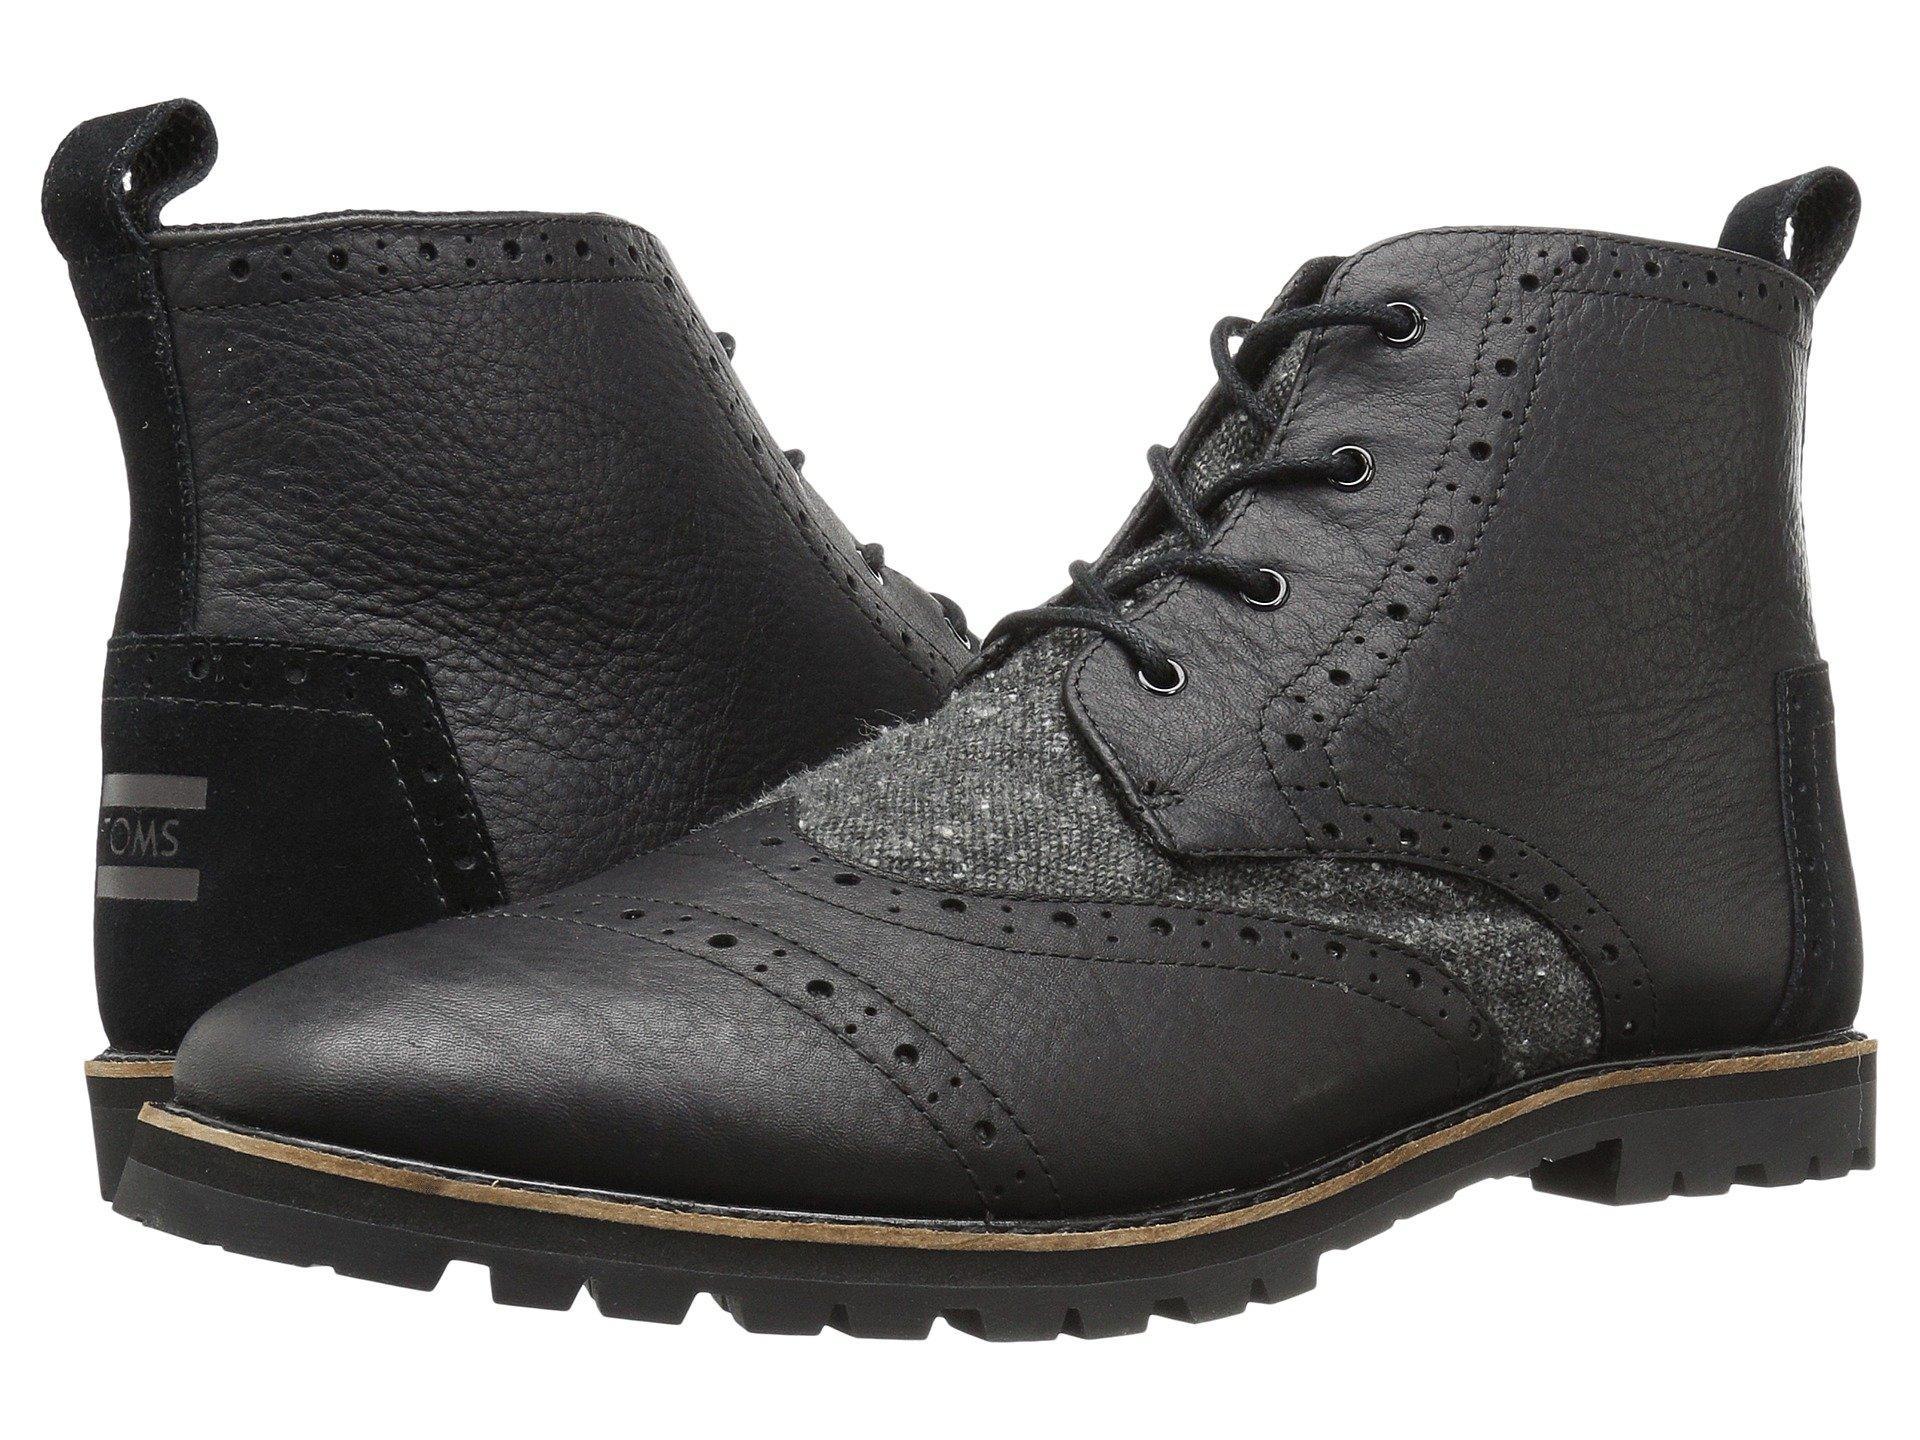 innovative design meet skate shoes Toms , Black Leather/charcoal Fleck   ModeSens